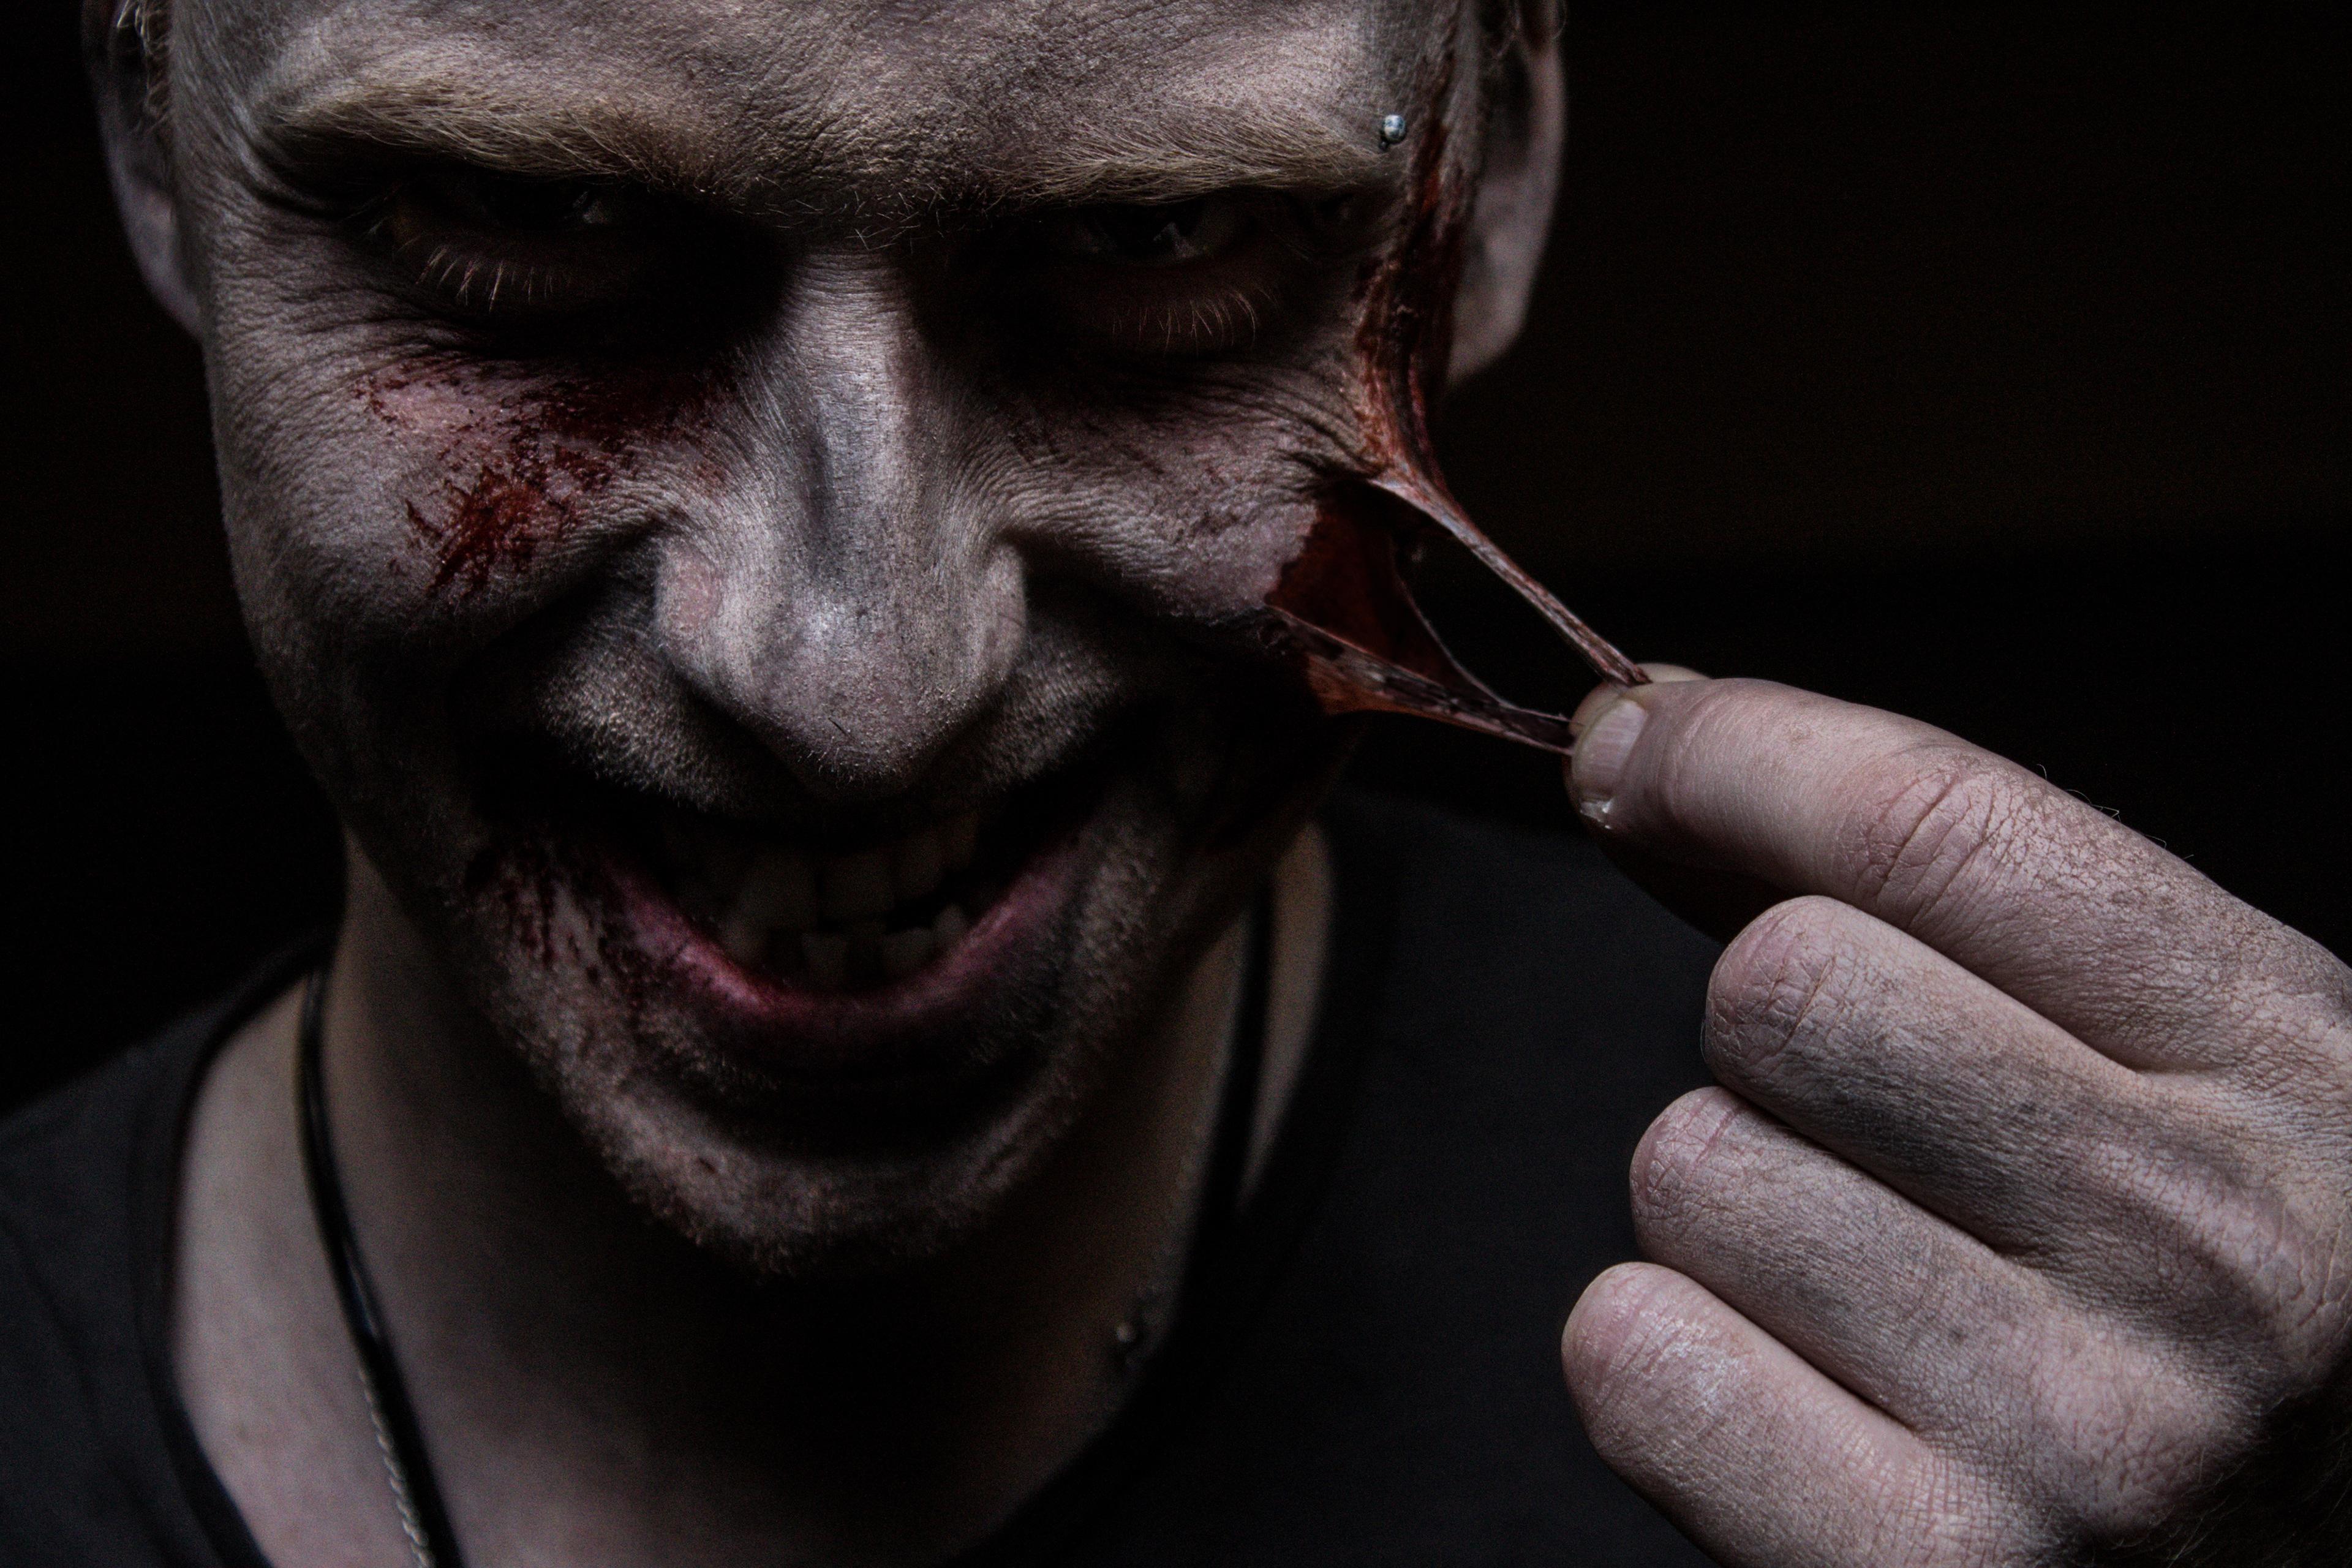 Картинки ухо в крови